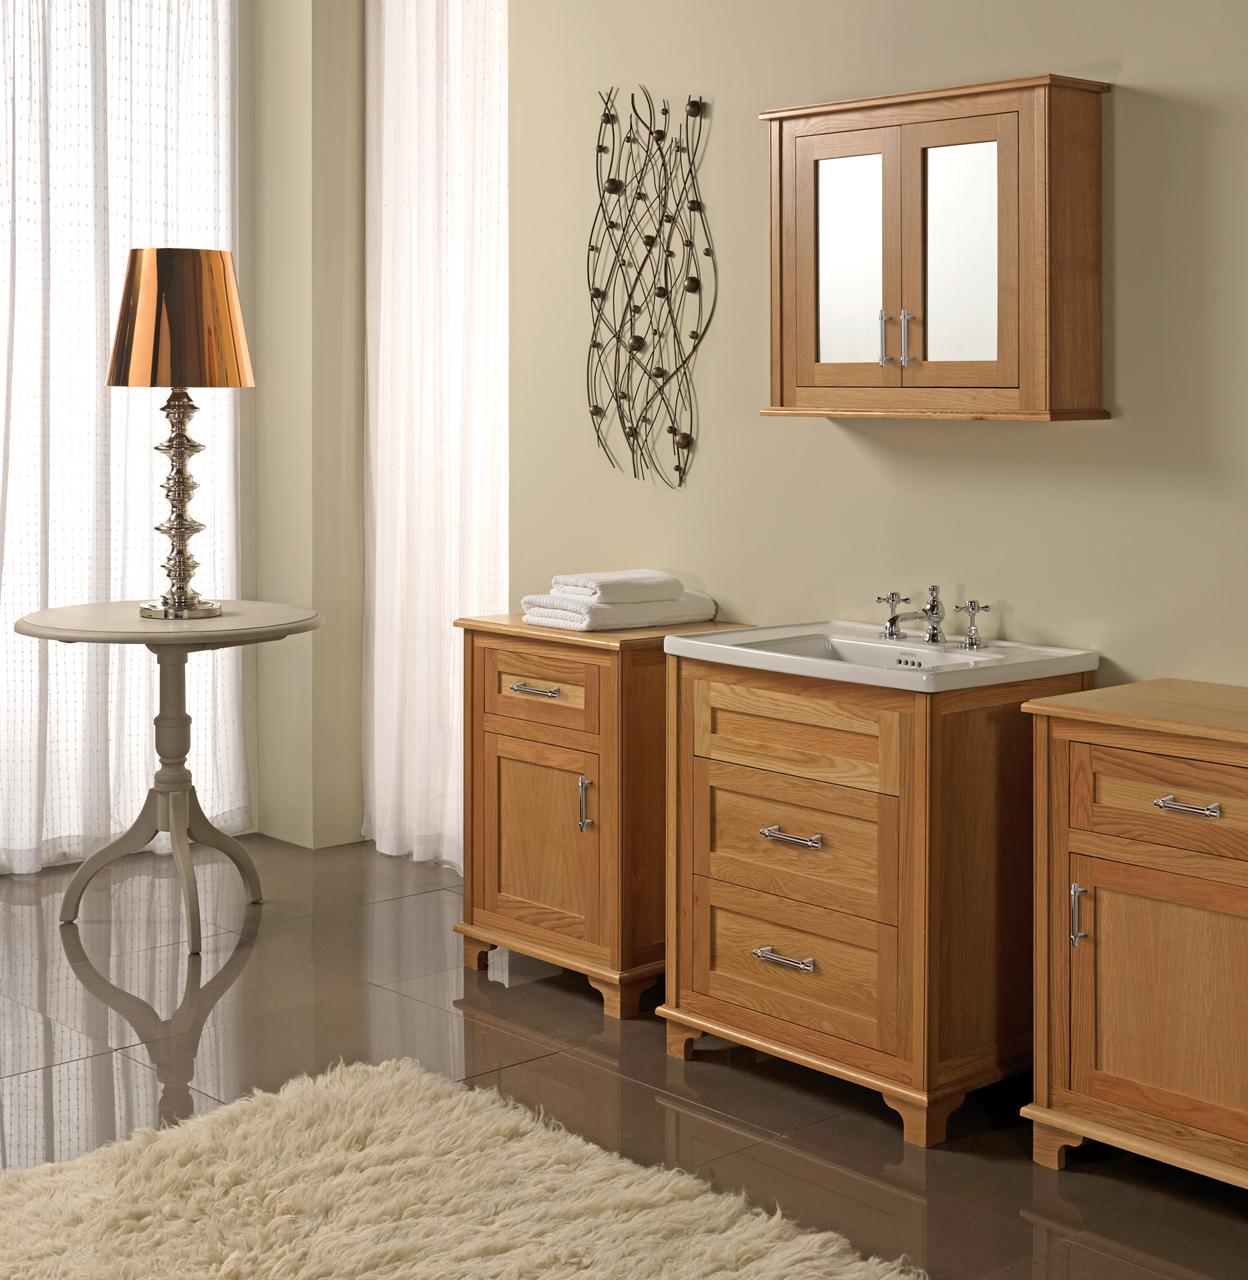 Classic Bathrooms: Imperial Bathrooms - Oak-Set-main